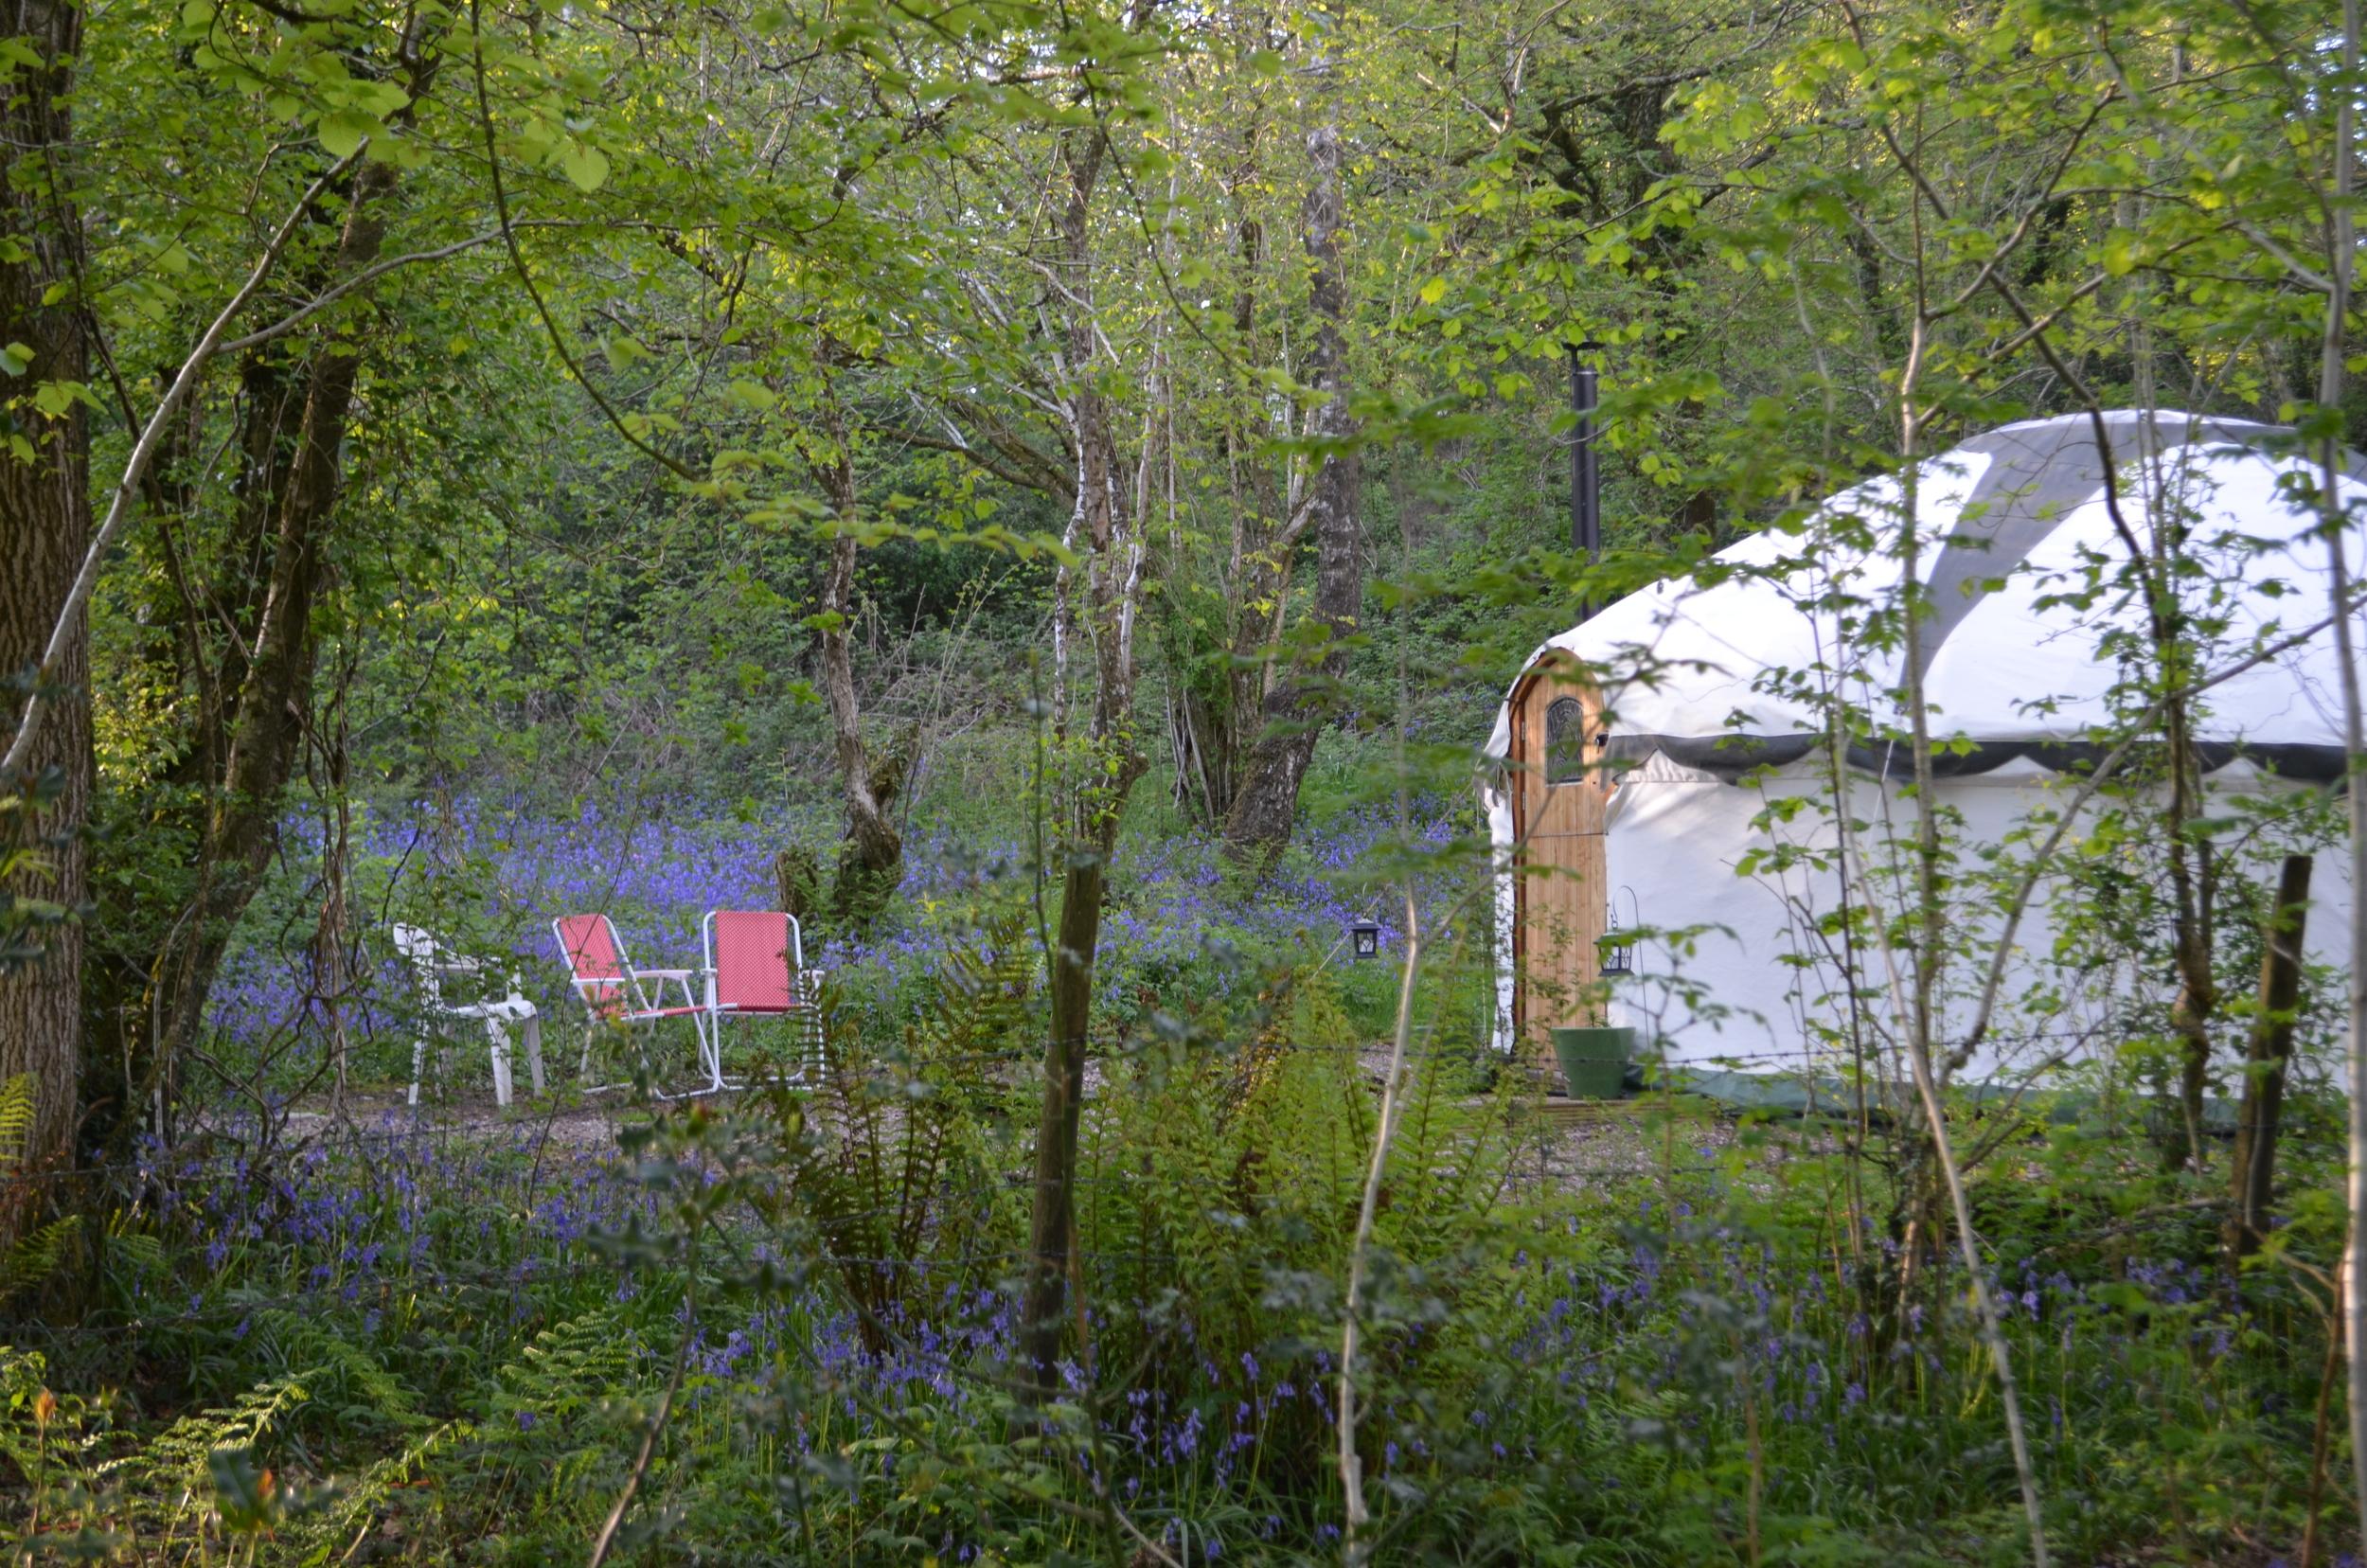 yurt in the bluebells